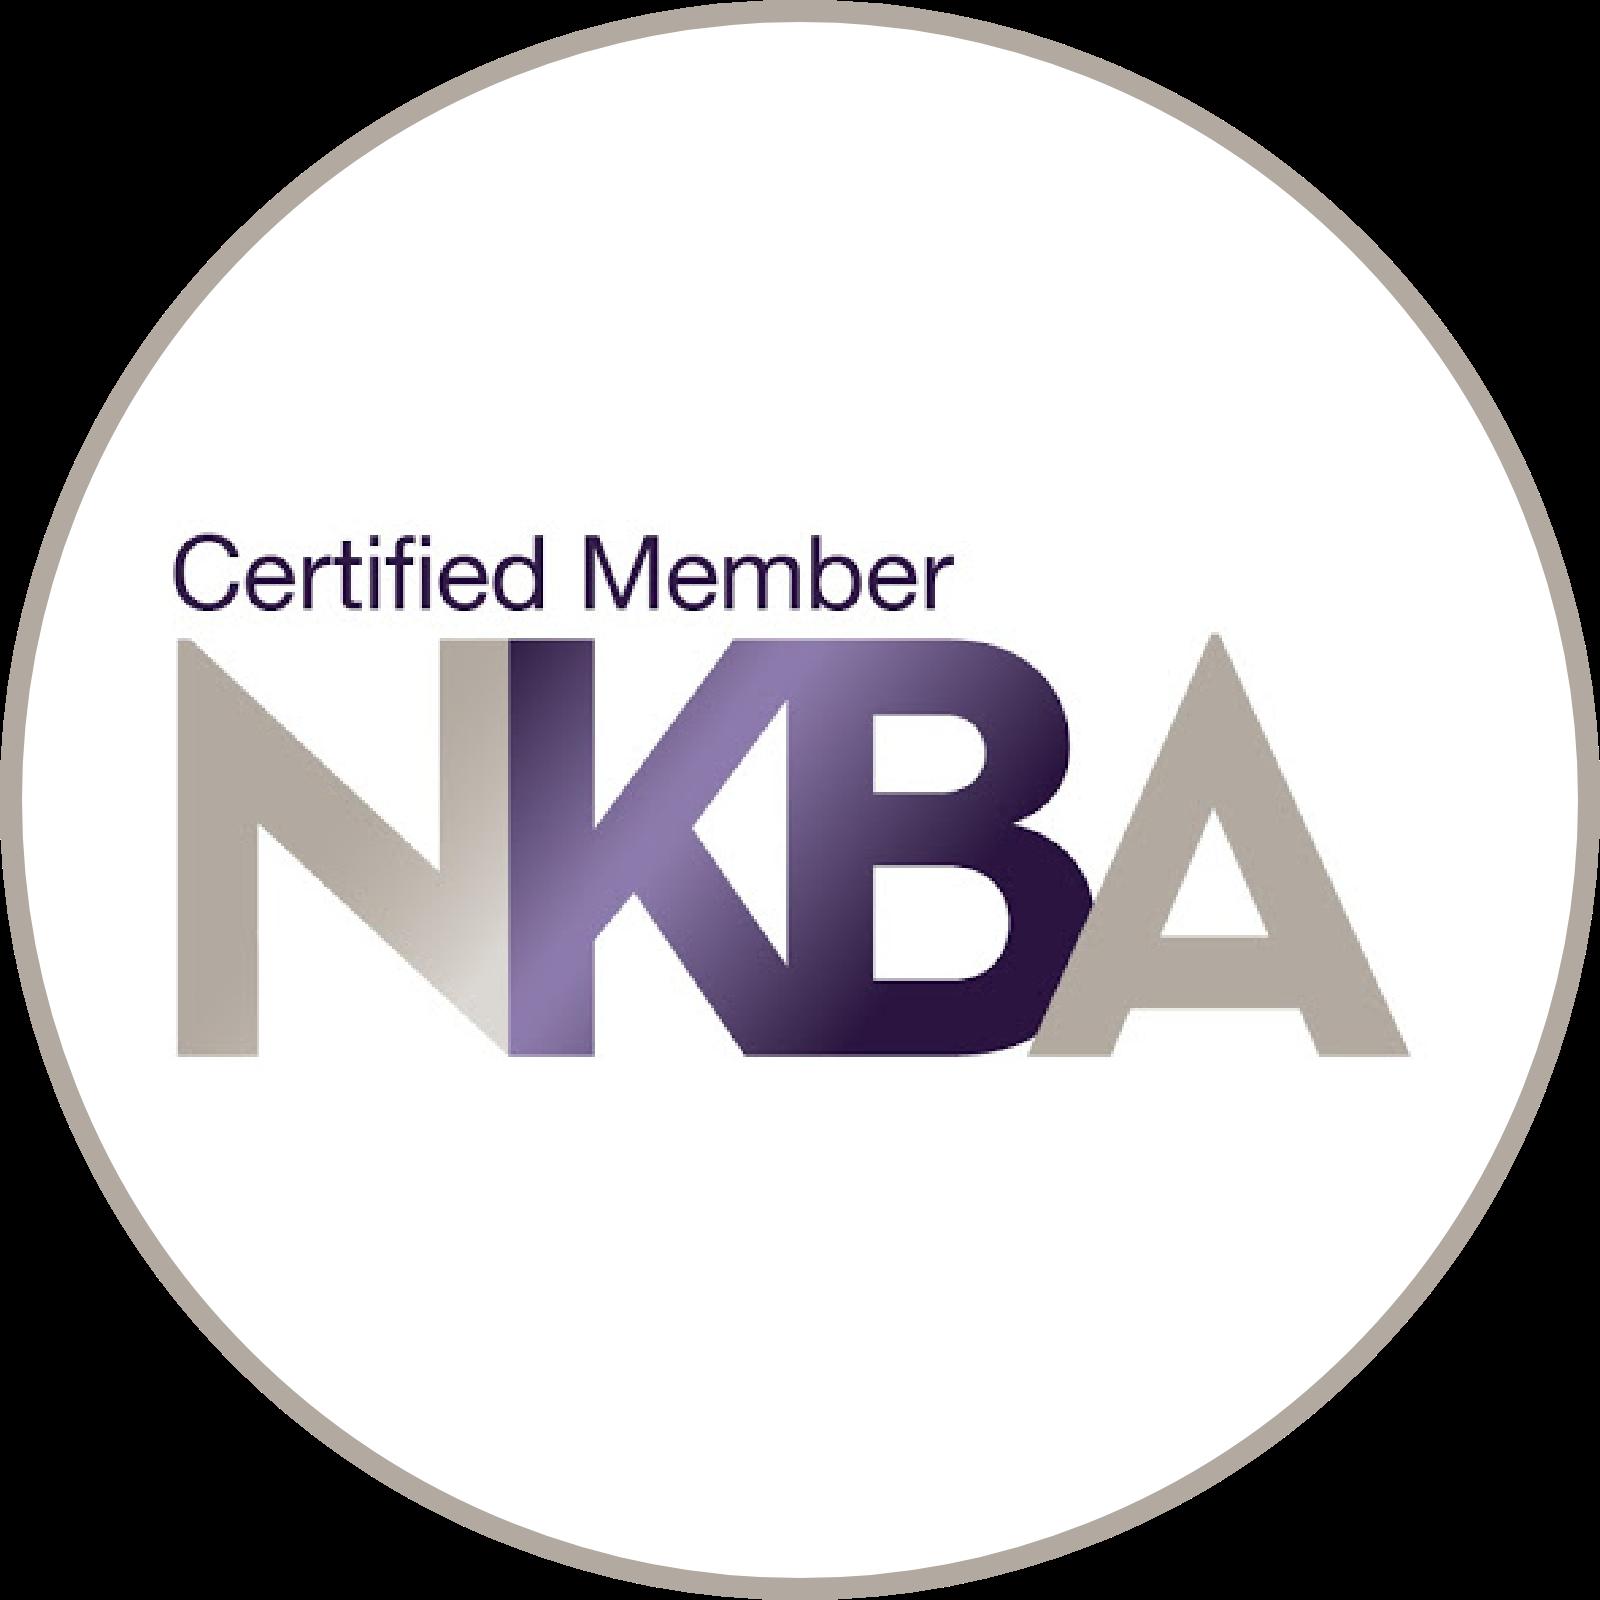 A certified member of National Kitchen & Bath Association